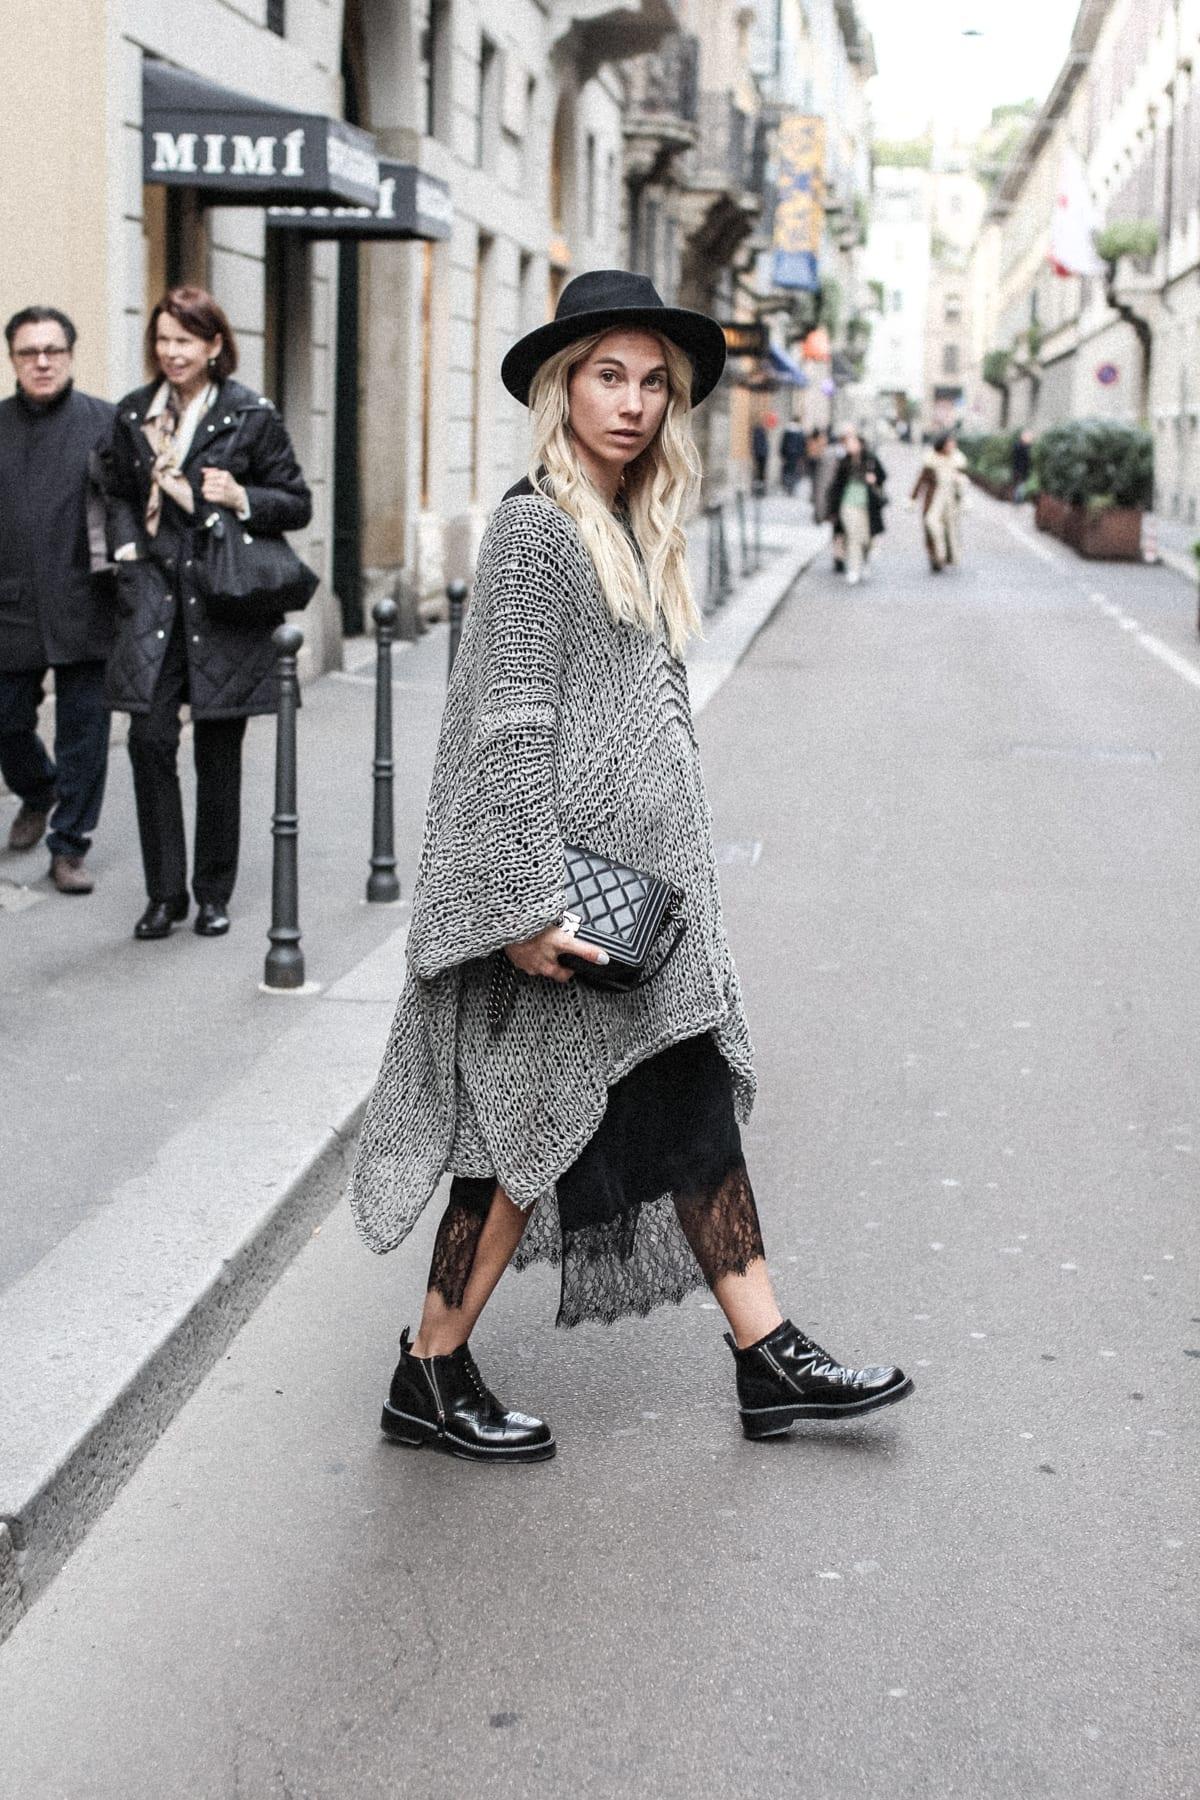 CK_1604_Constantly-K-milano-street-style-fashion-eataly-3743